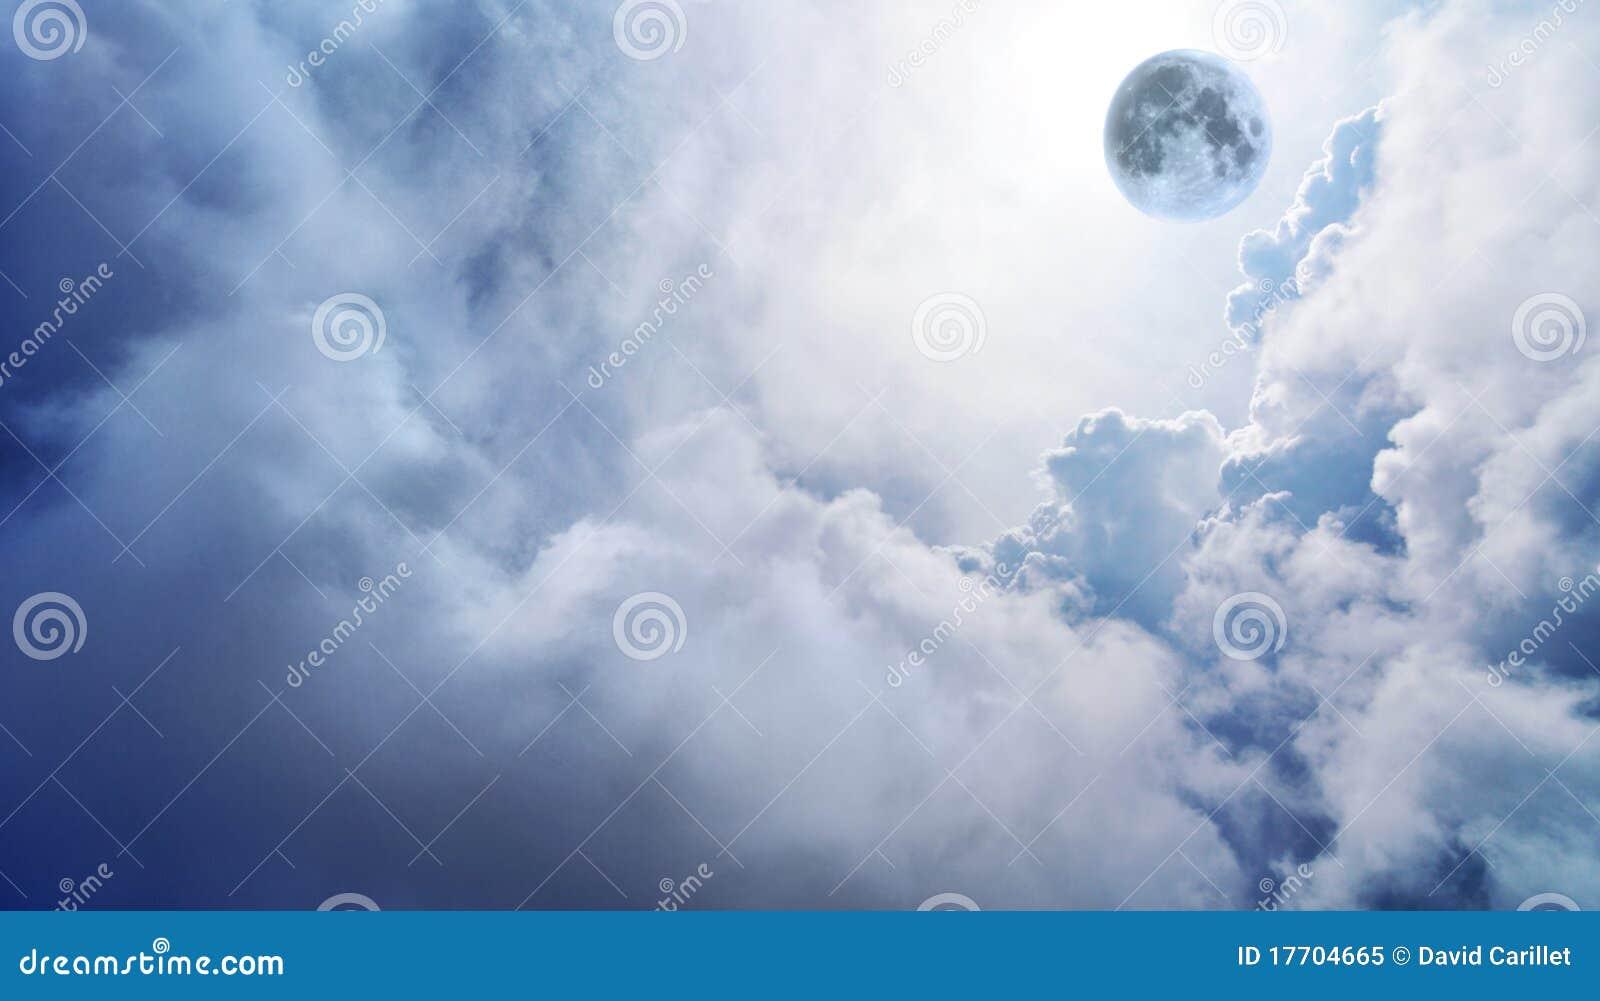 Full moon in dreamy fantasy sky